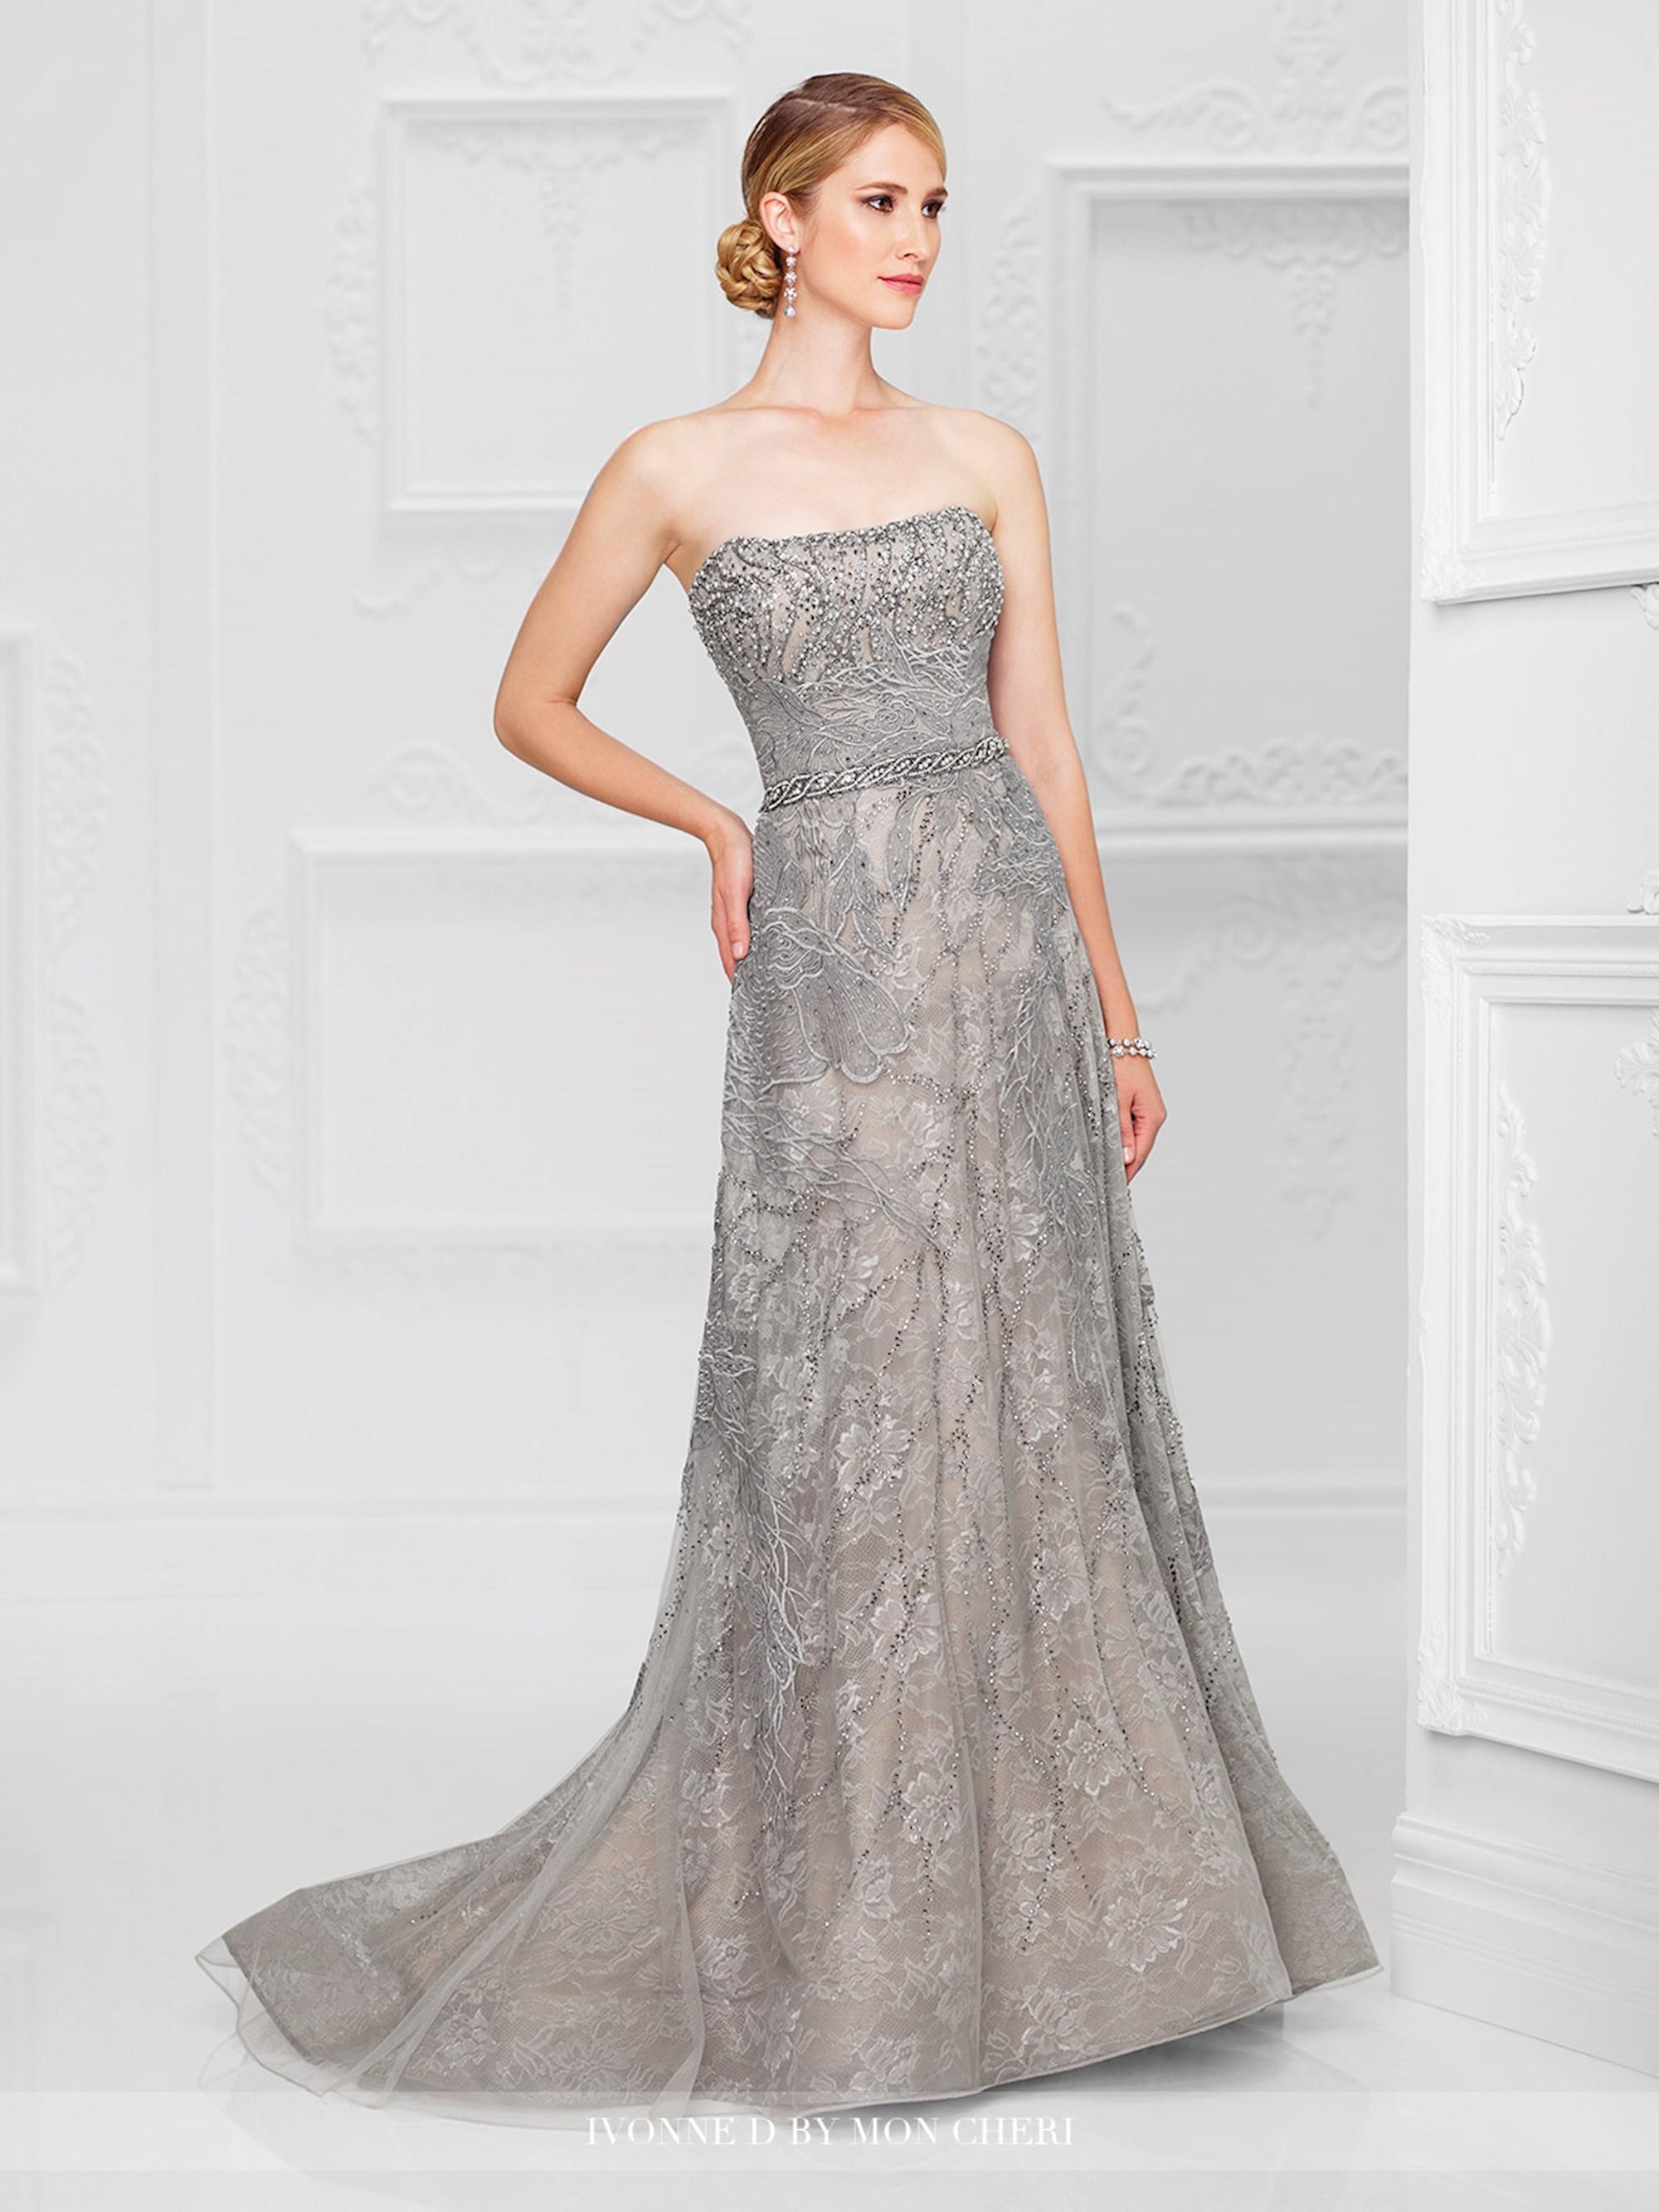 d0b6158b62 Couture Ivonne D Mother Of The Bride Dresses 2018 For Mon Cheri ...